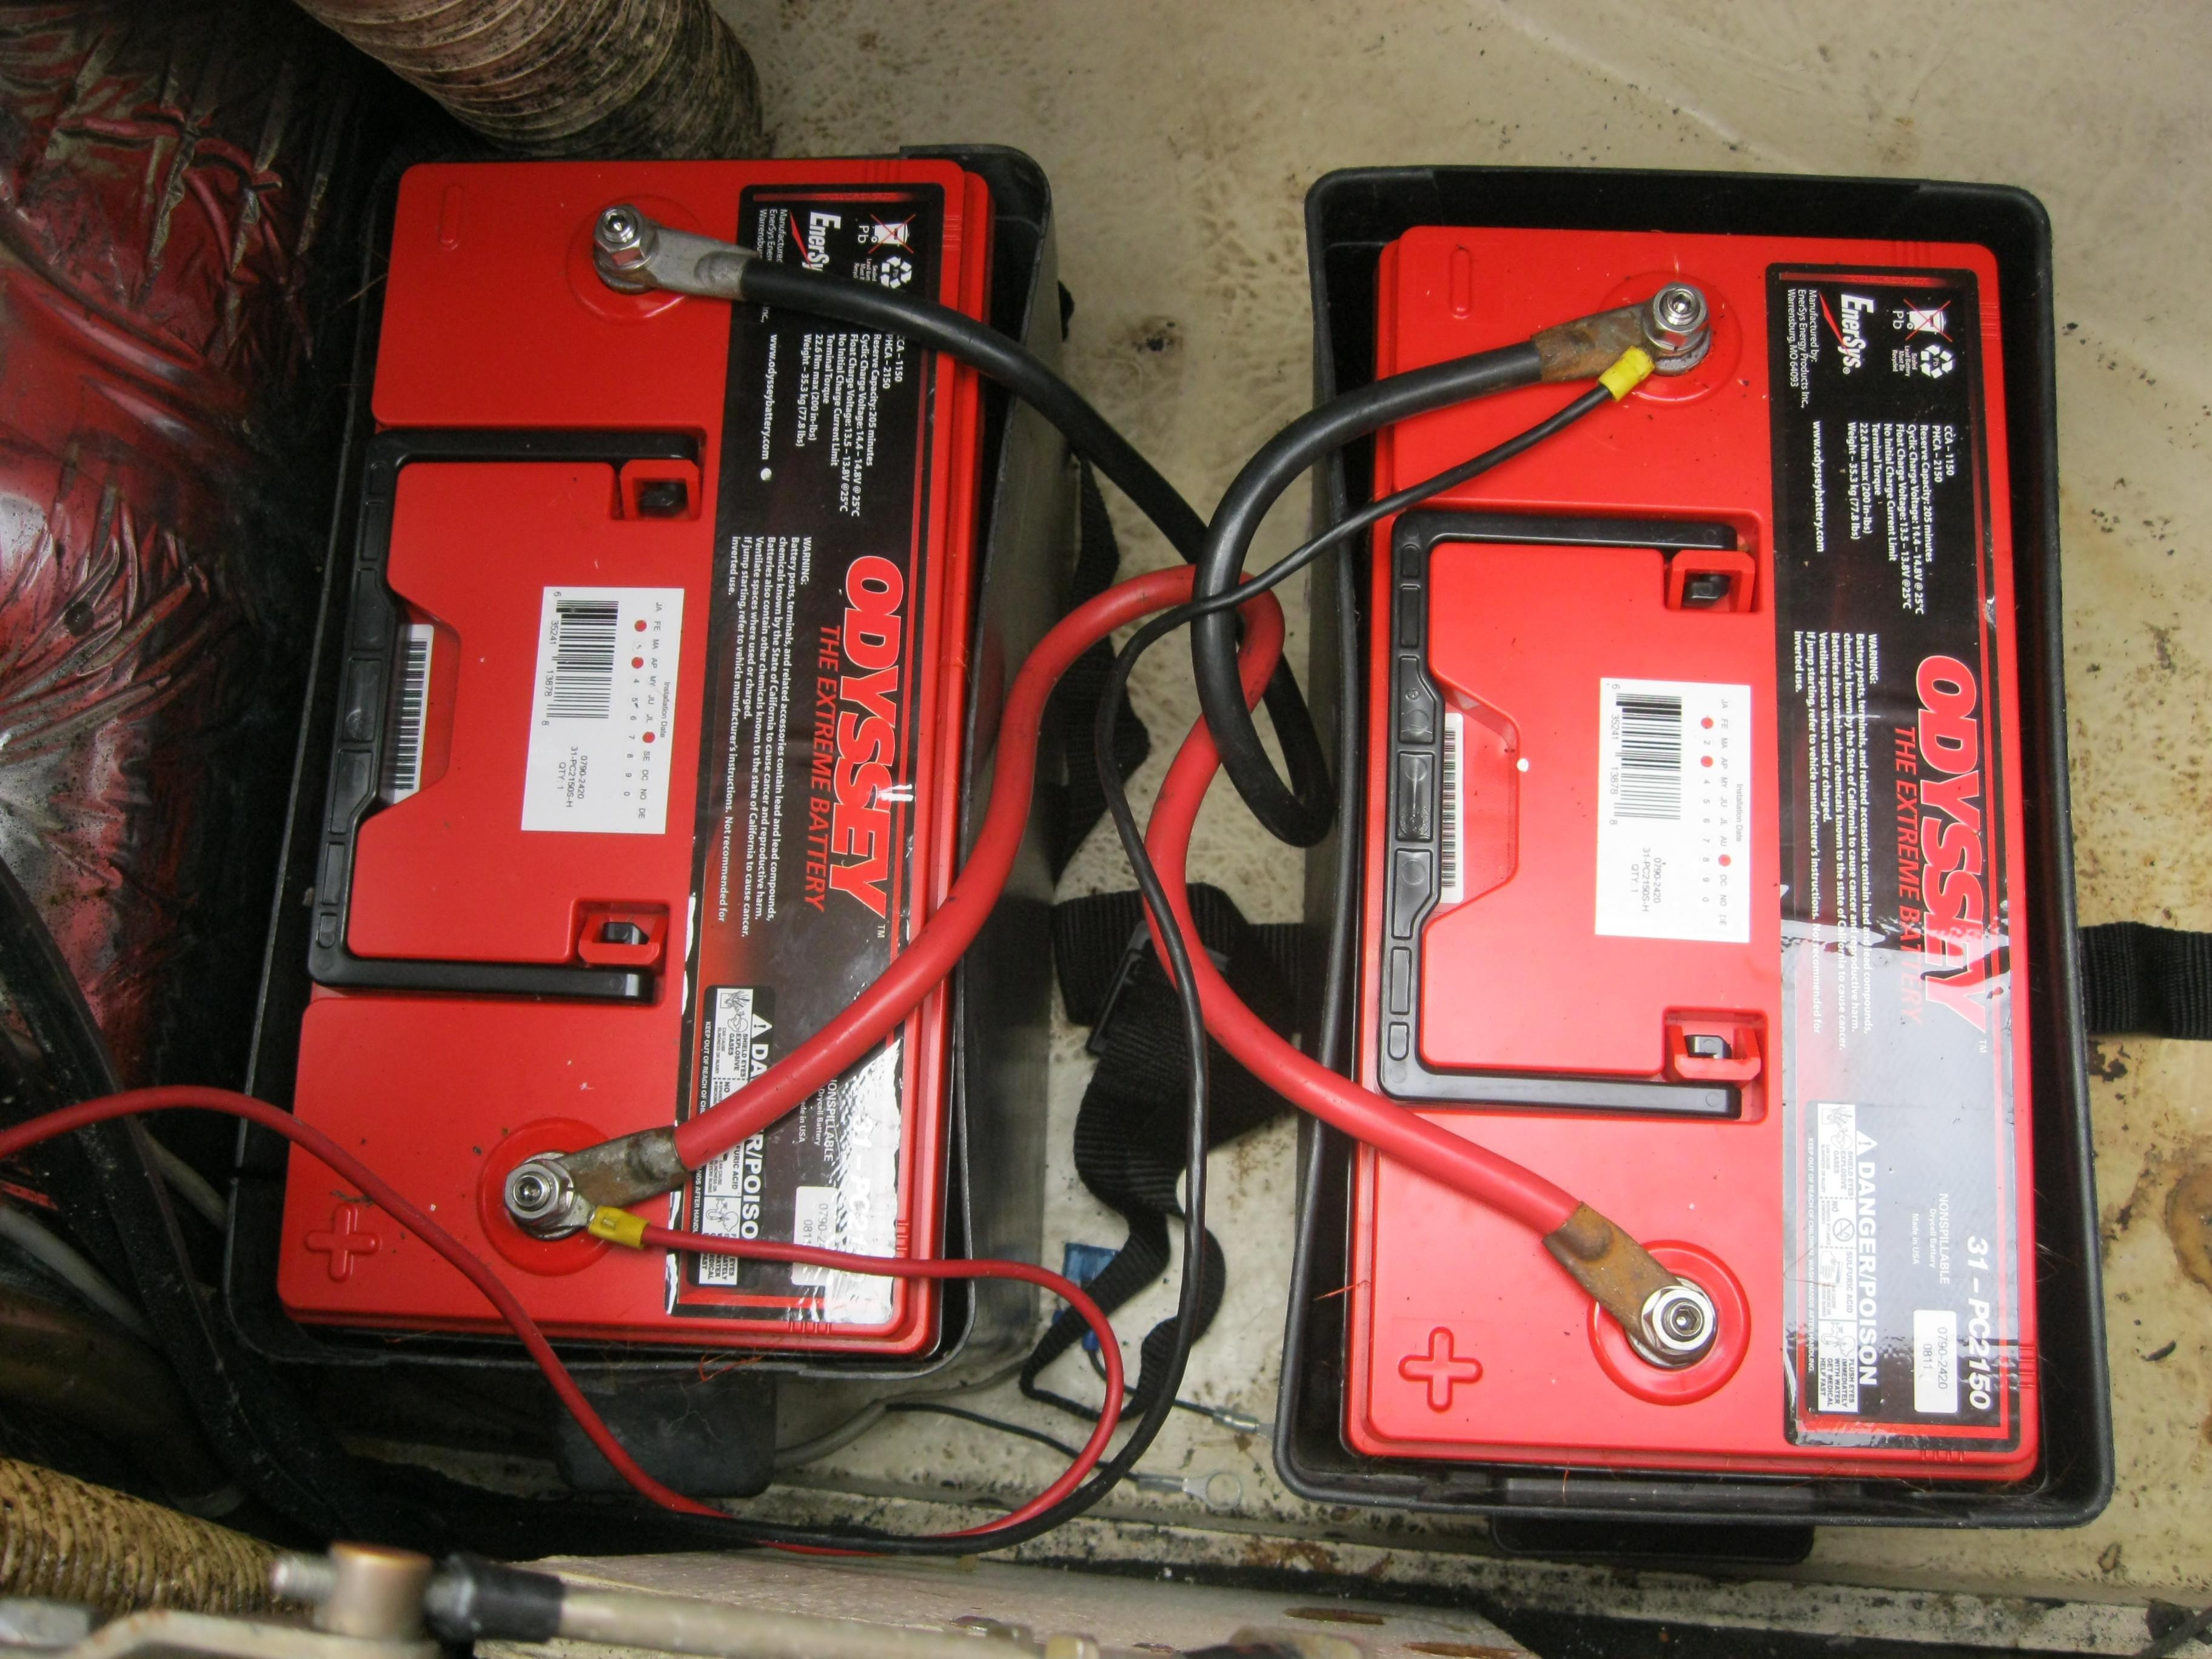 yamaha jet boat dual battery wiring diagram kt 8806  boat dual battery switch wiring diagram  boat dual battery switch wiring diagram